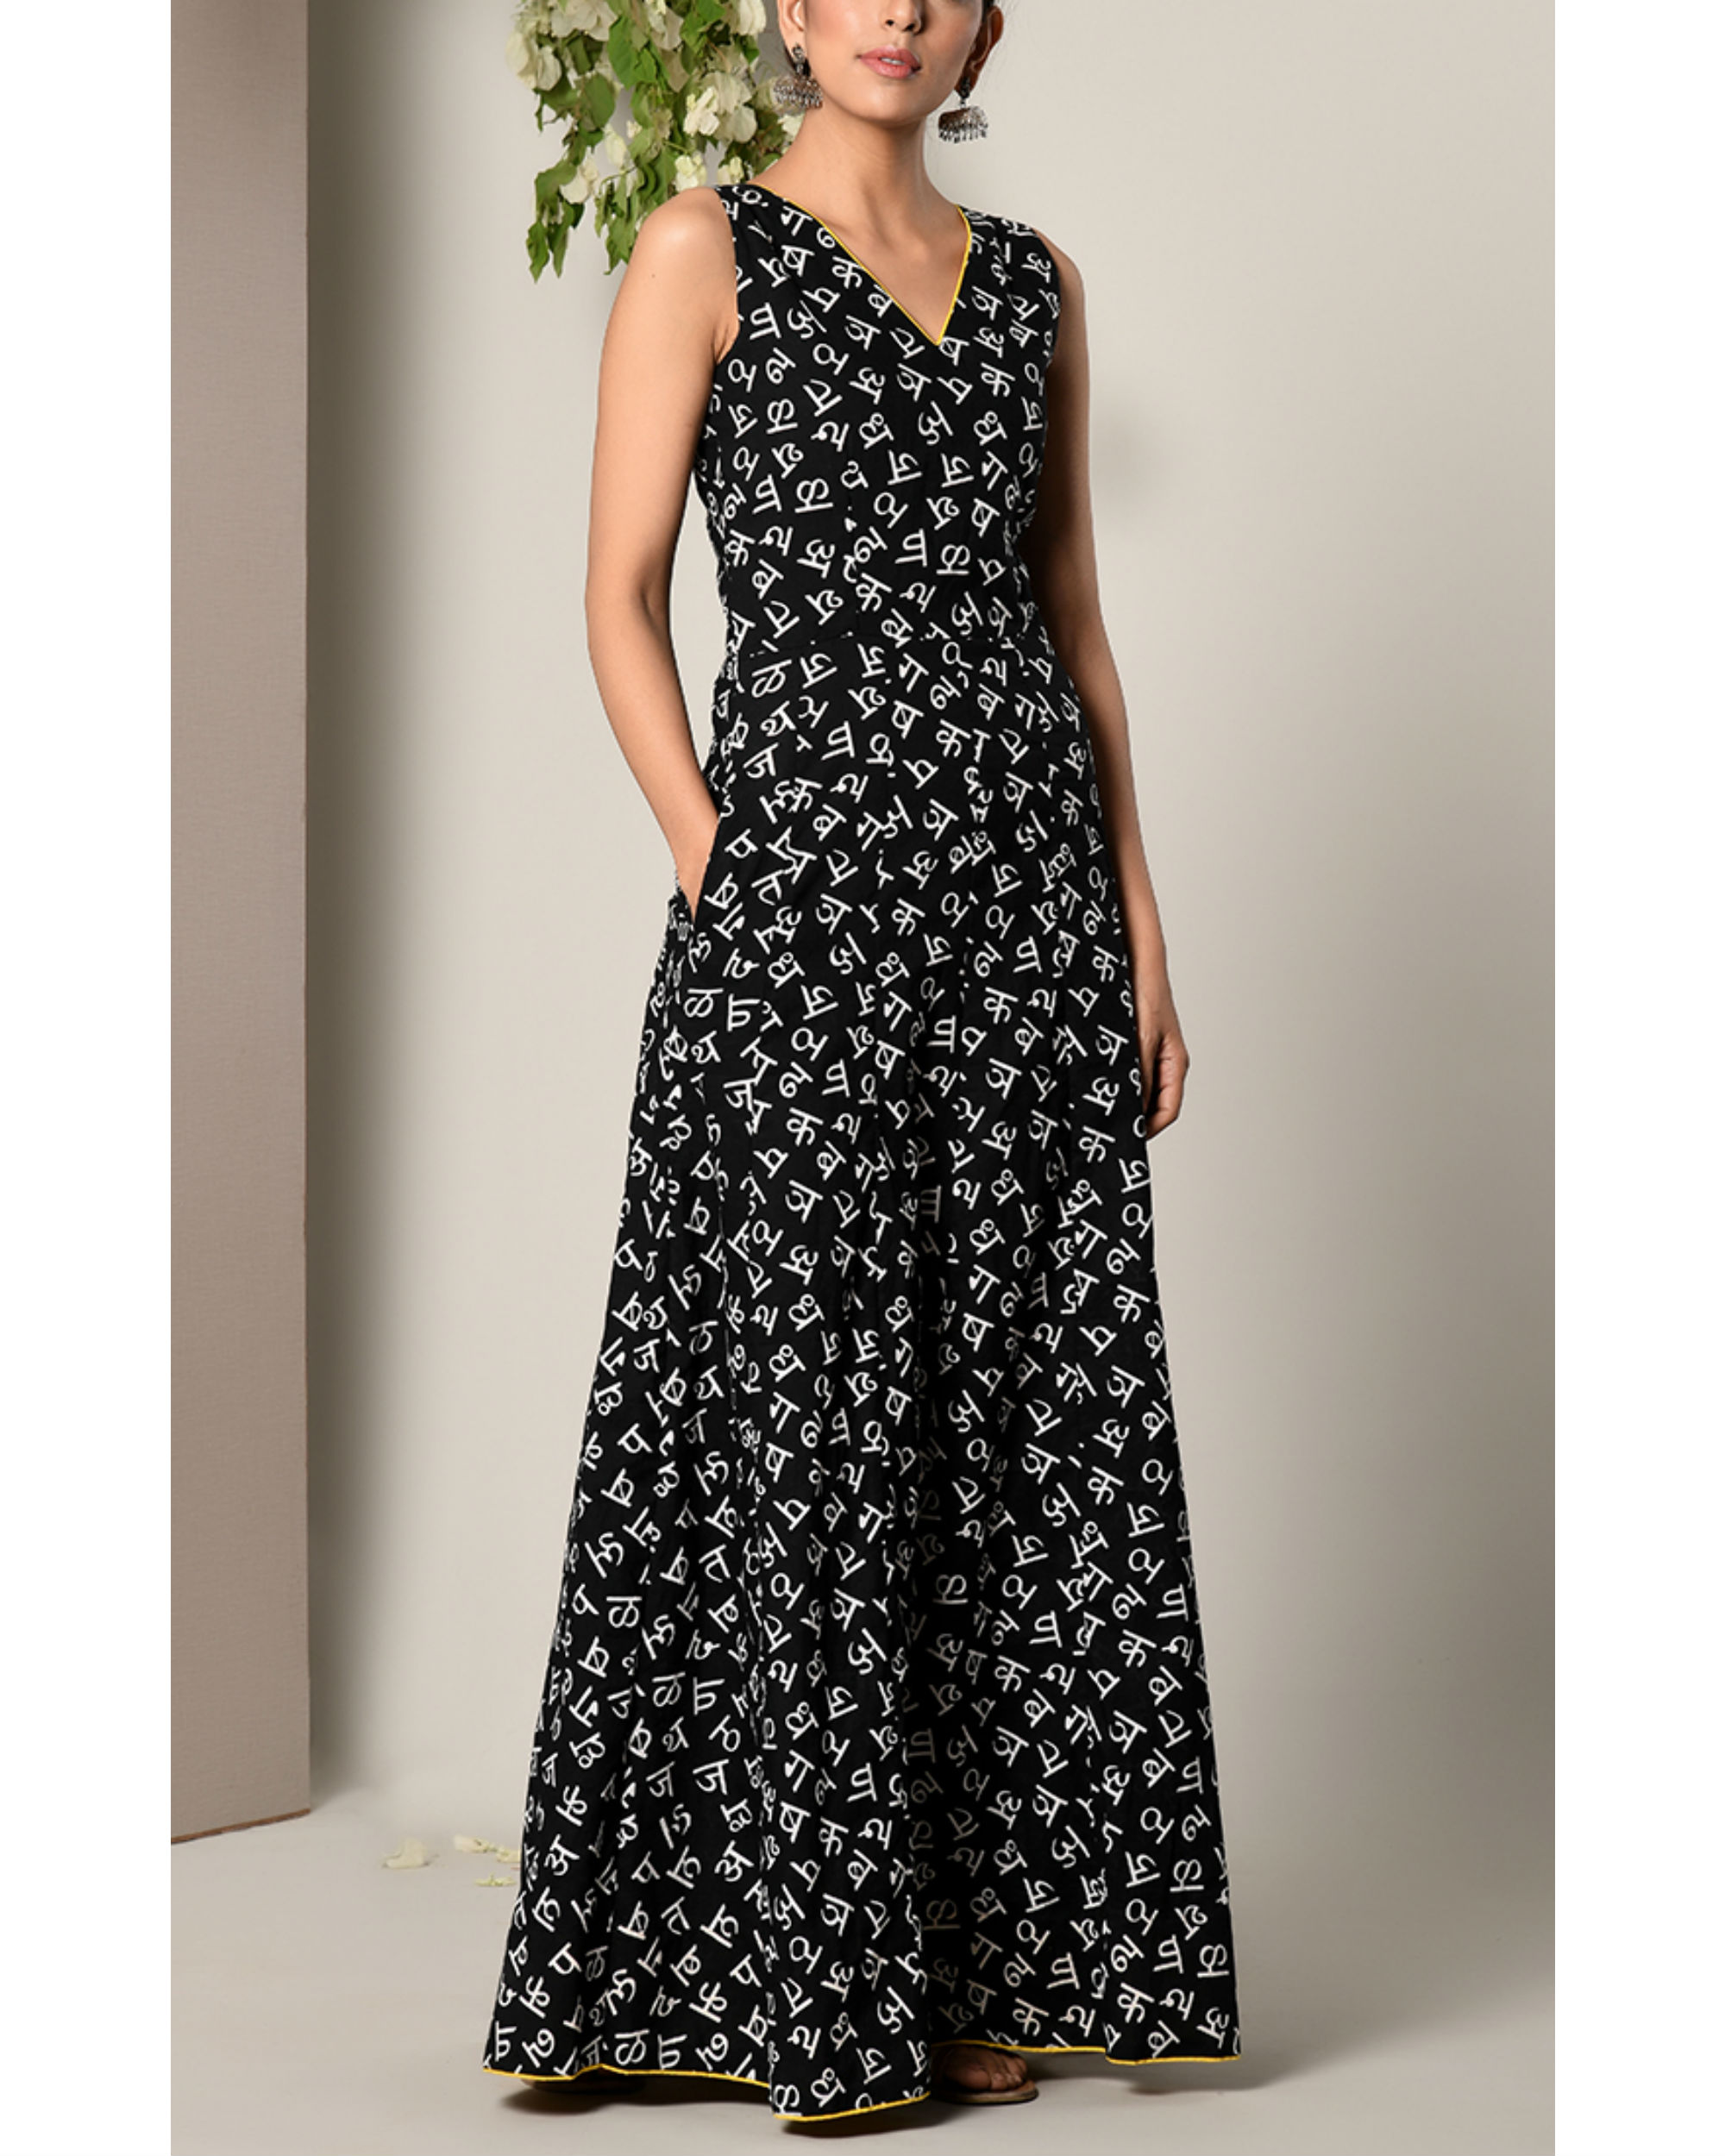 Black alphabet dress